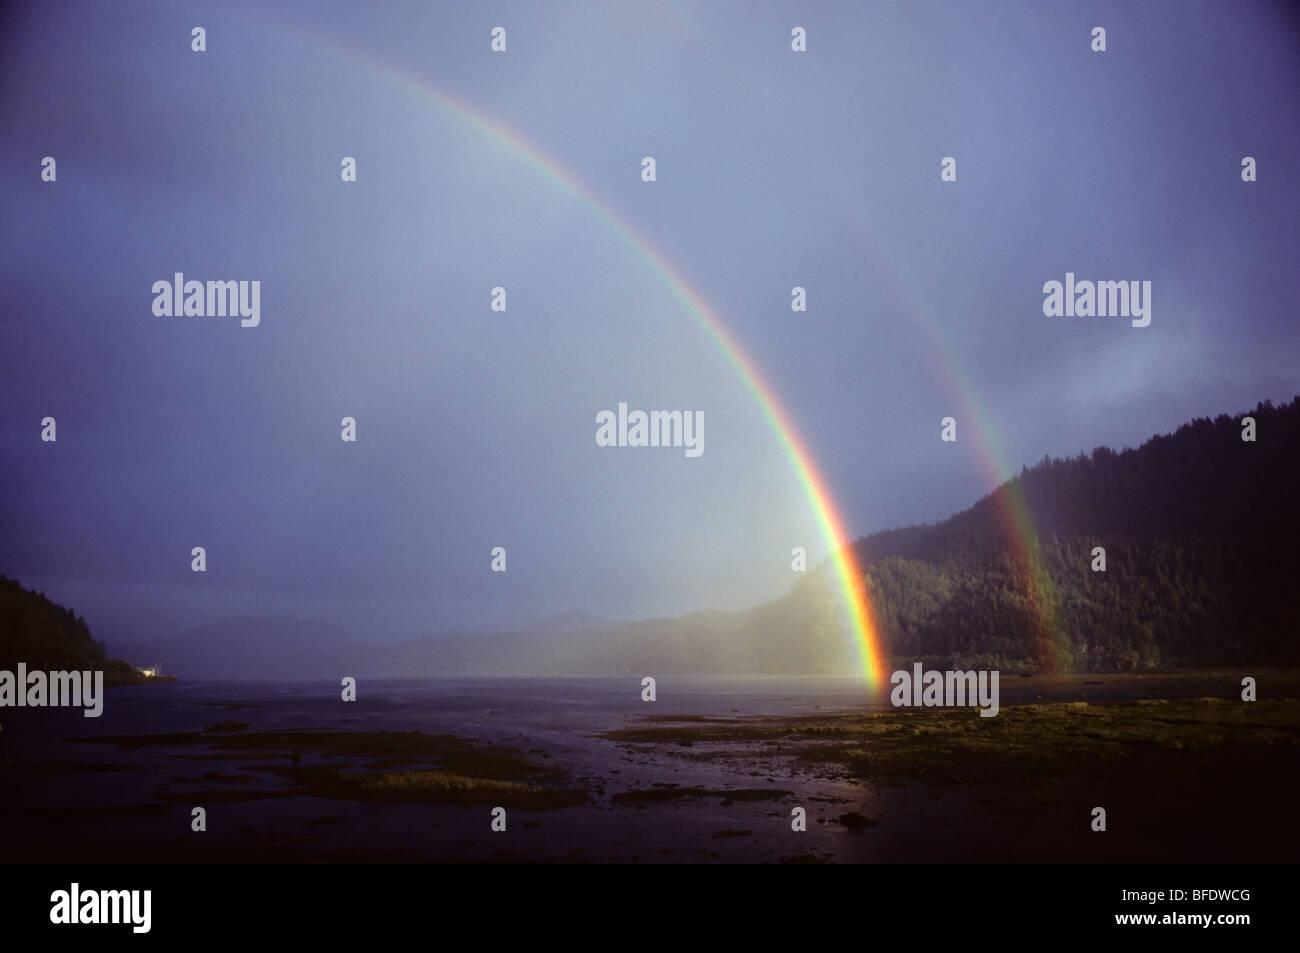 Double rainbow over the coast of Holberg, Vancouver Island, British Columbia, Canada - Stock Image